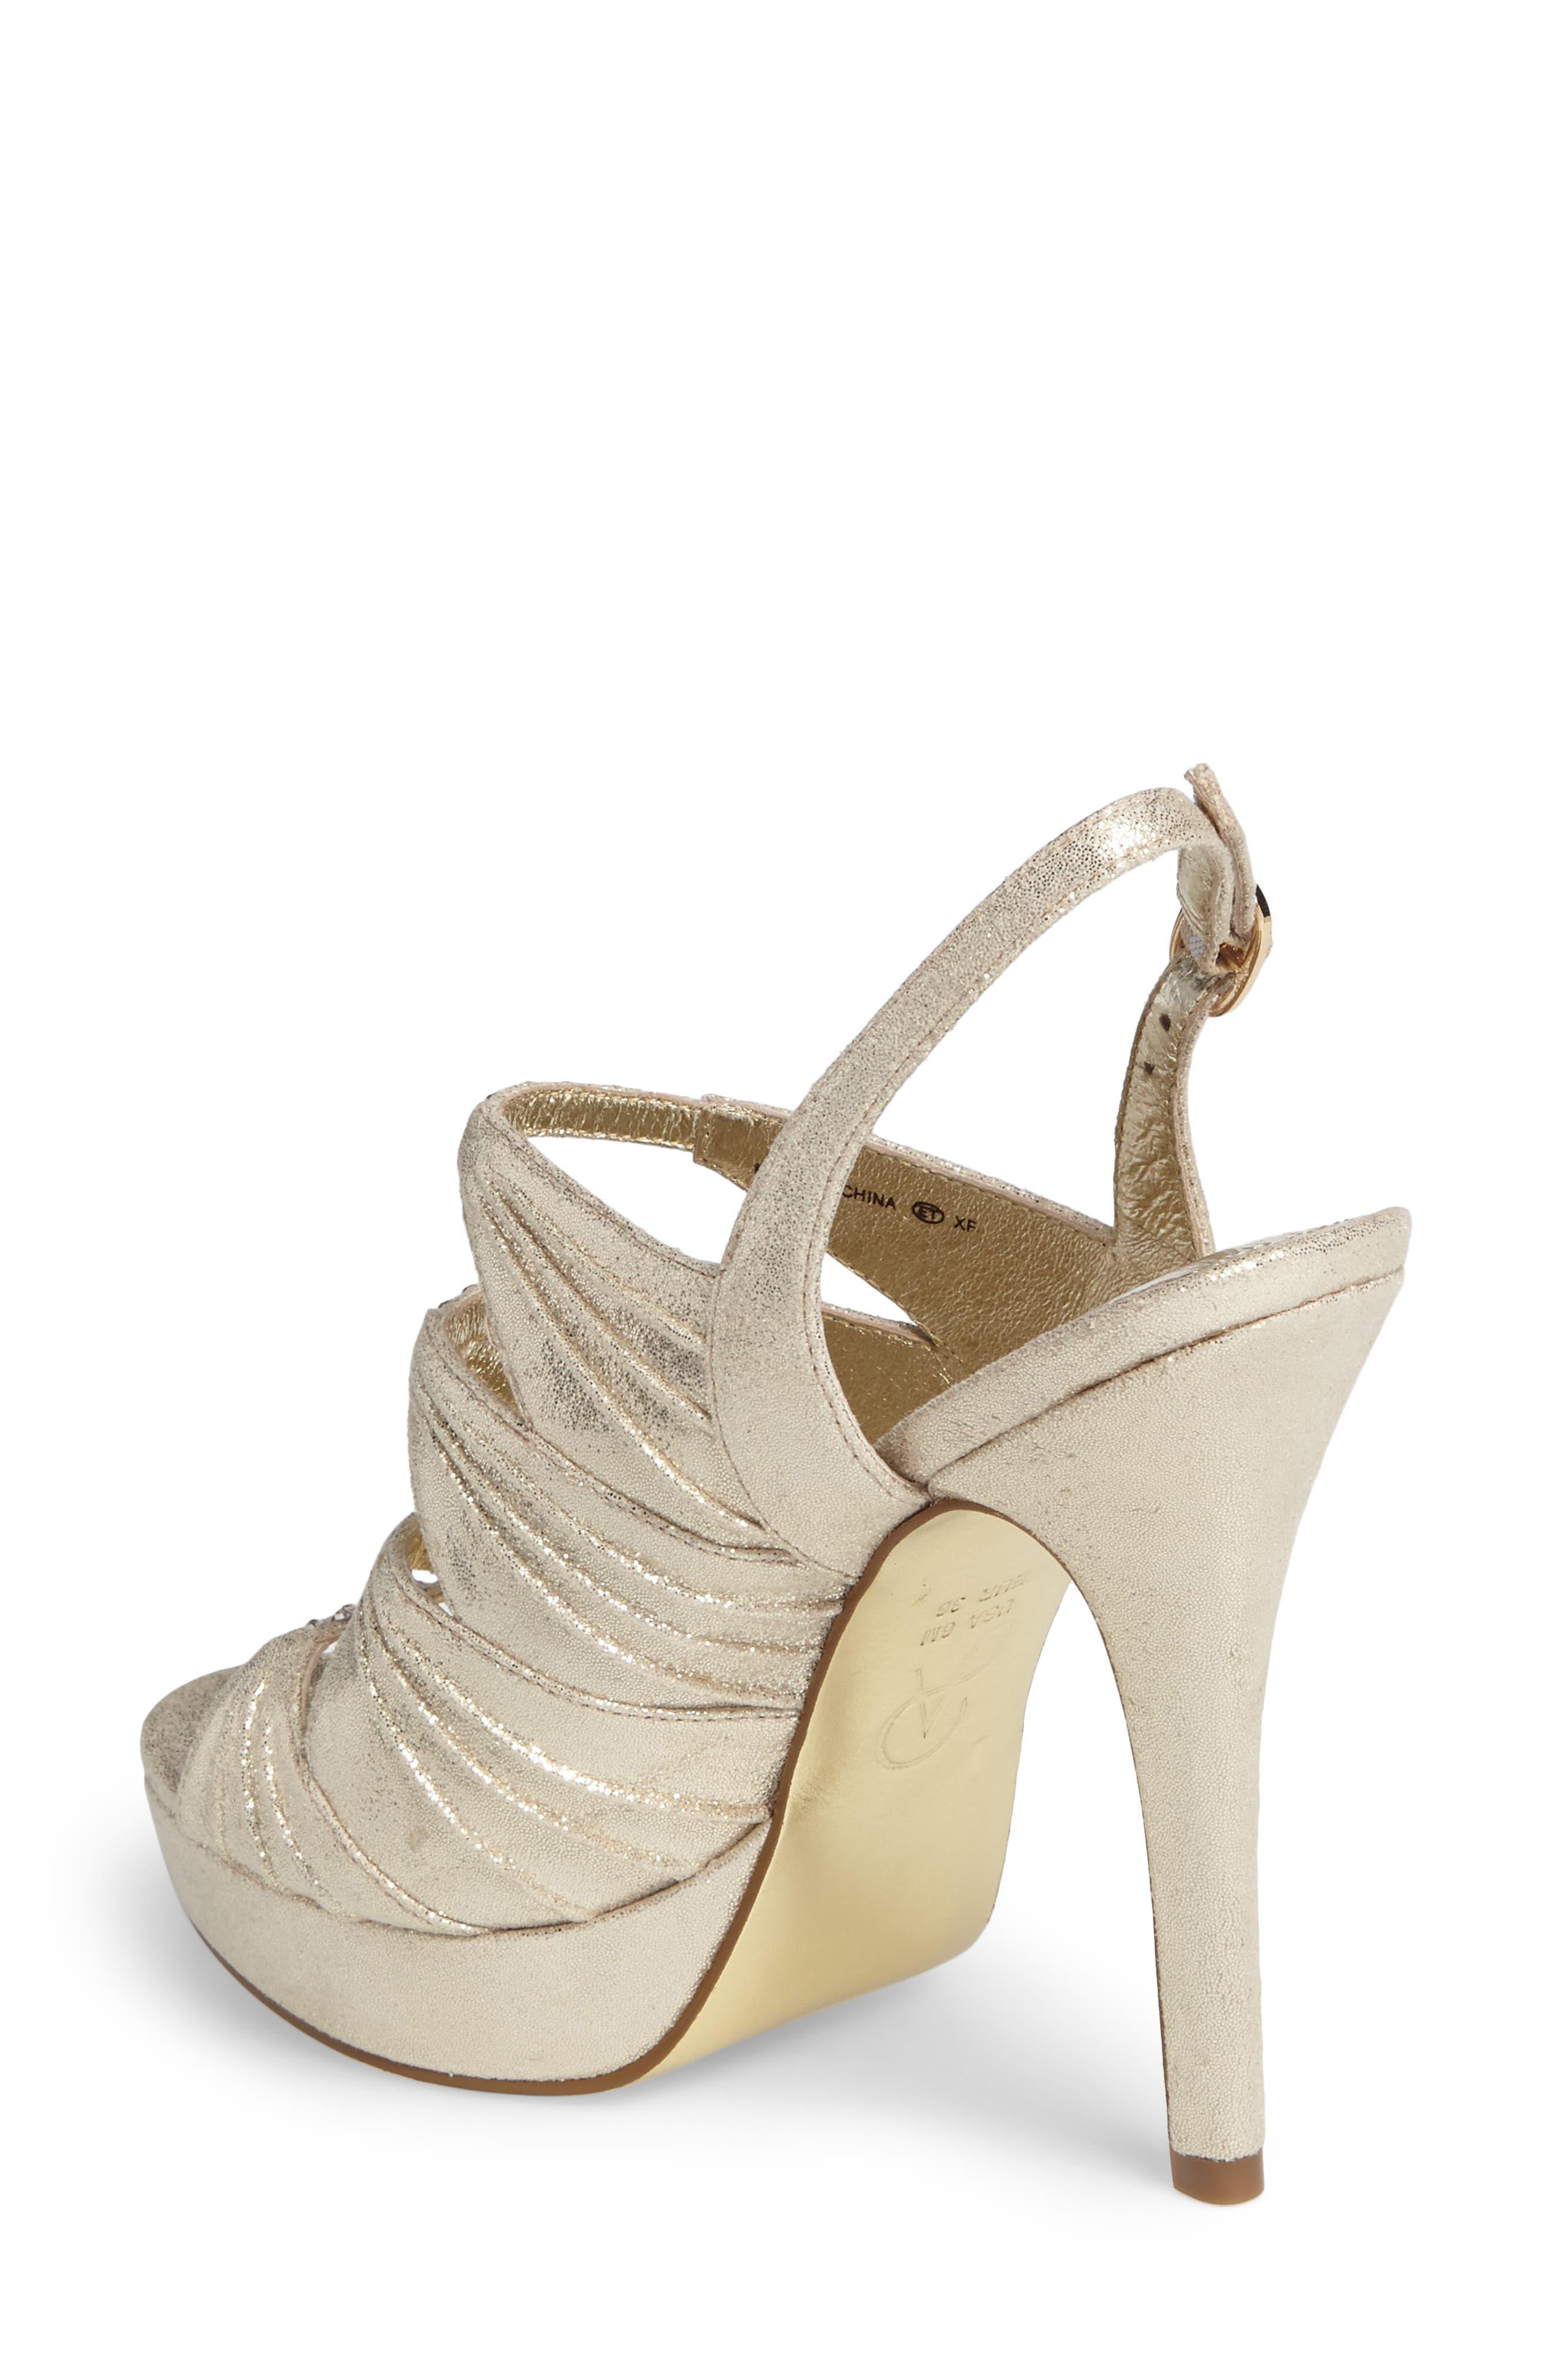 Alternate Image 2  - Adrianna Pappell Marissa Platform Sandal (Women)